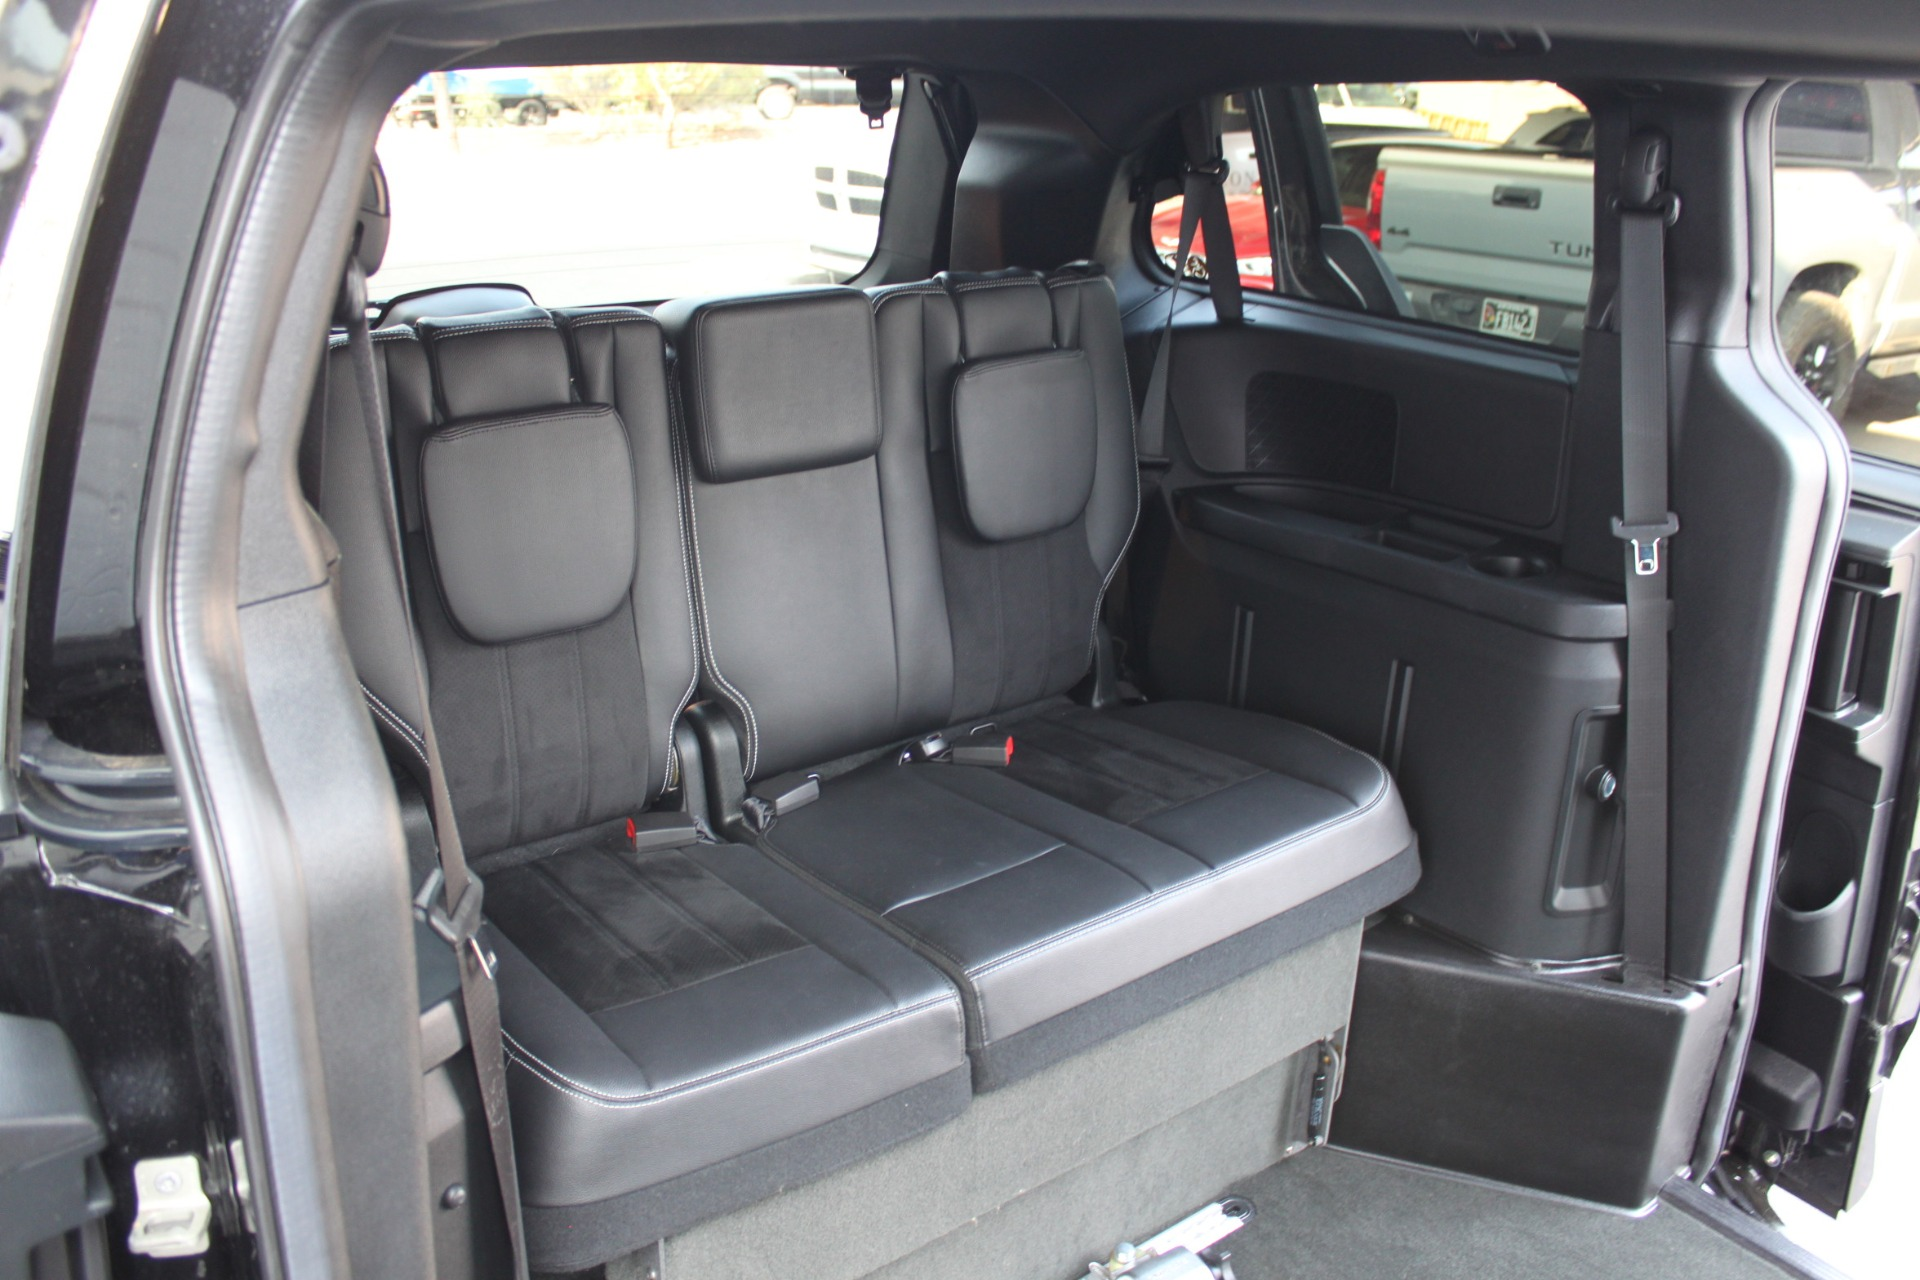 Used-2018-Dodge-Grand-Caravan-SXT-Rollx-Mobility-Conversion-Mercedes-Benz